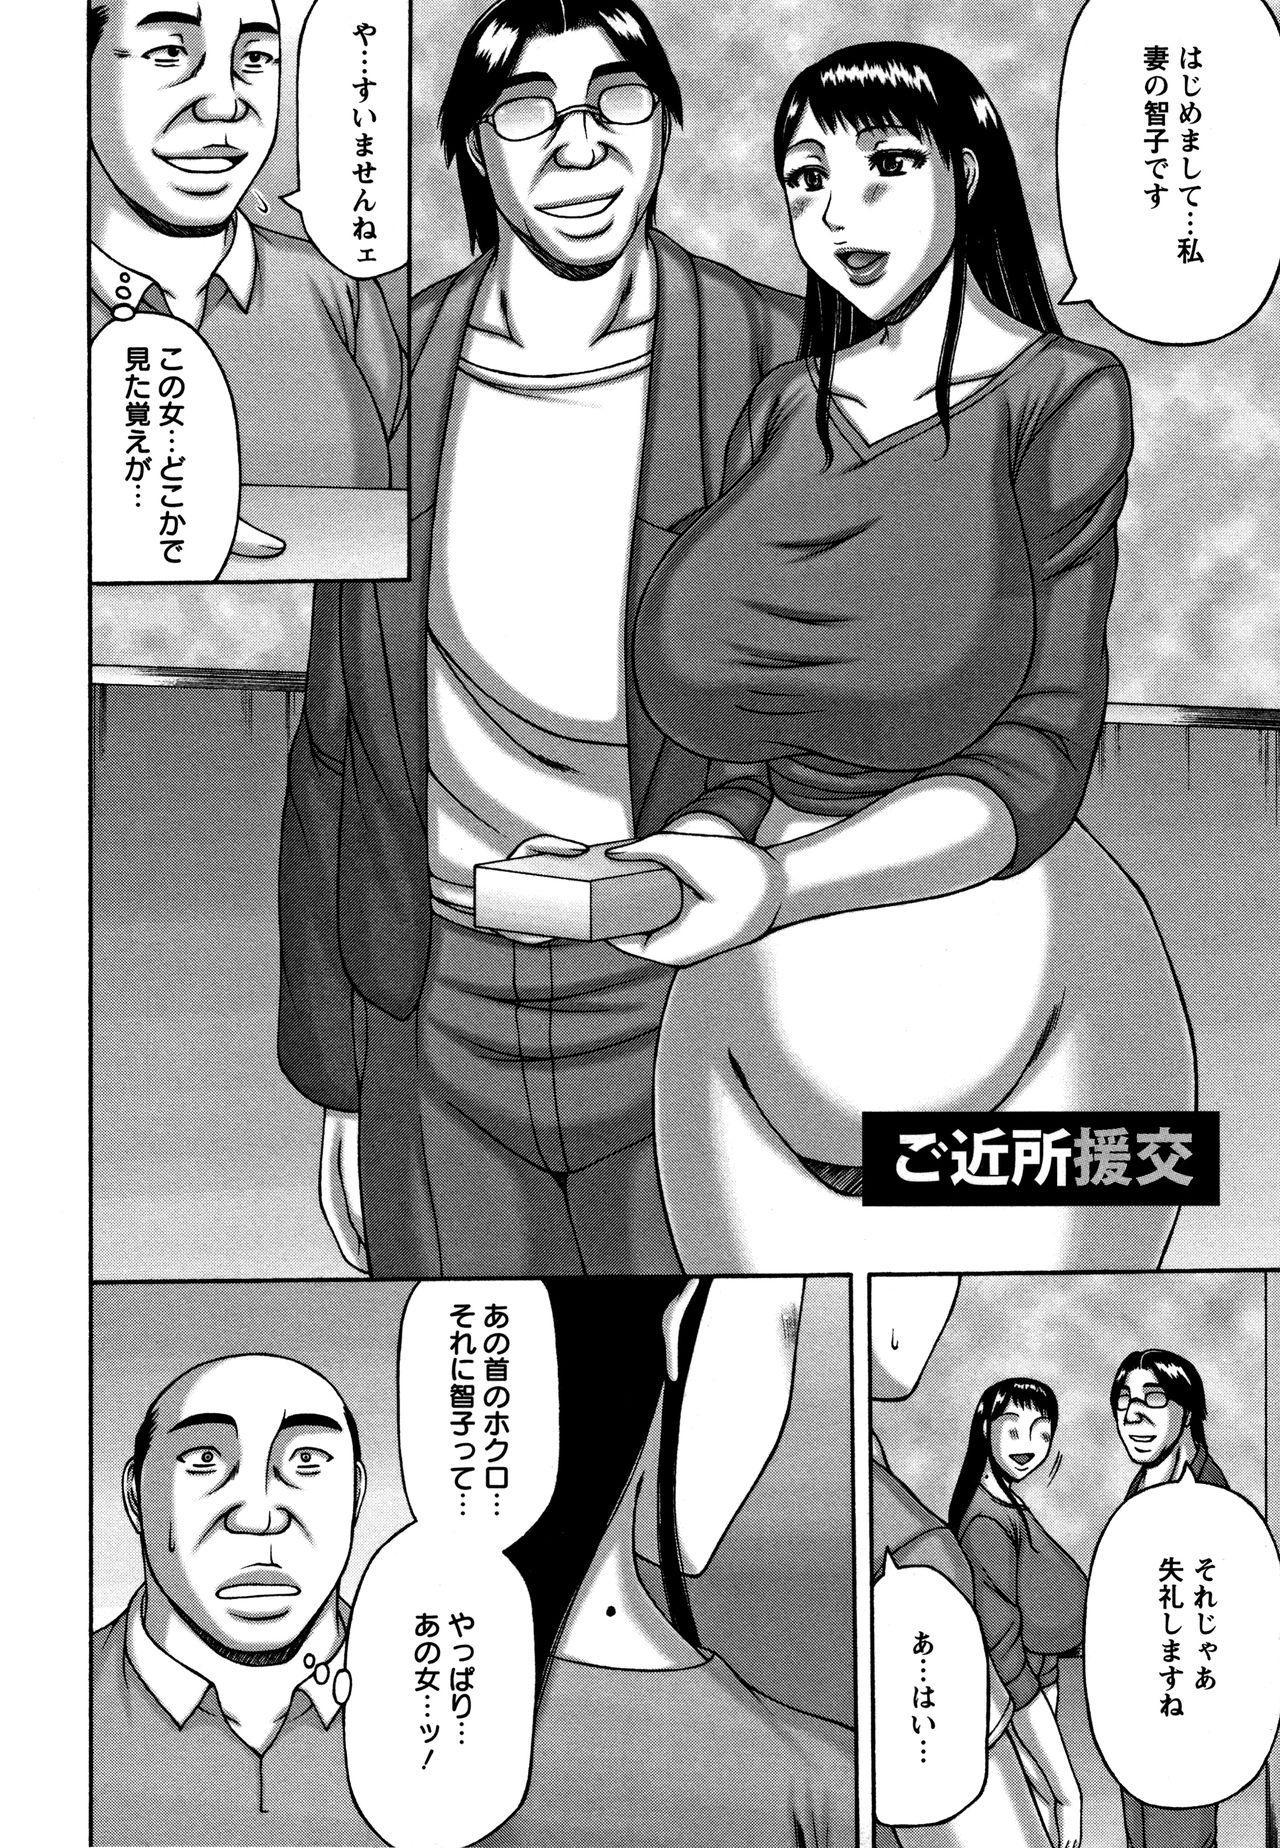 Tsuma no Netorare Kinenbi - My Wife NTR Memorial Day 146